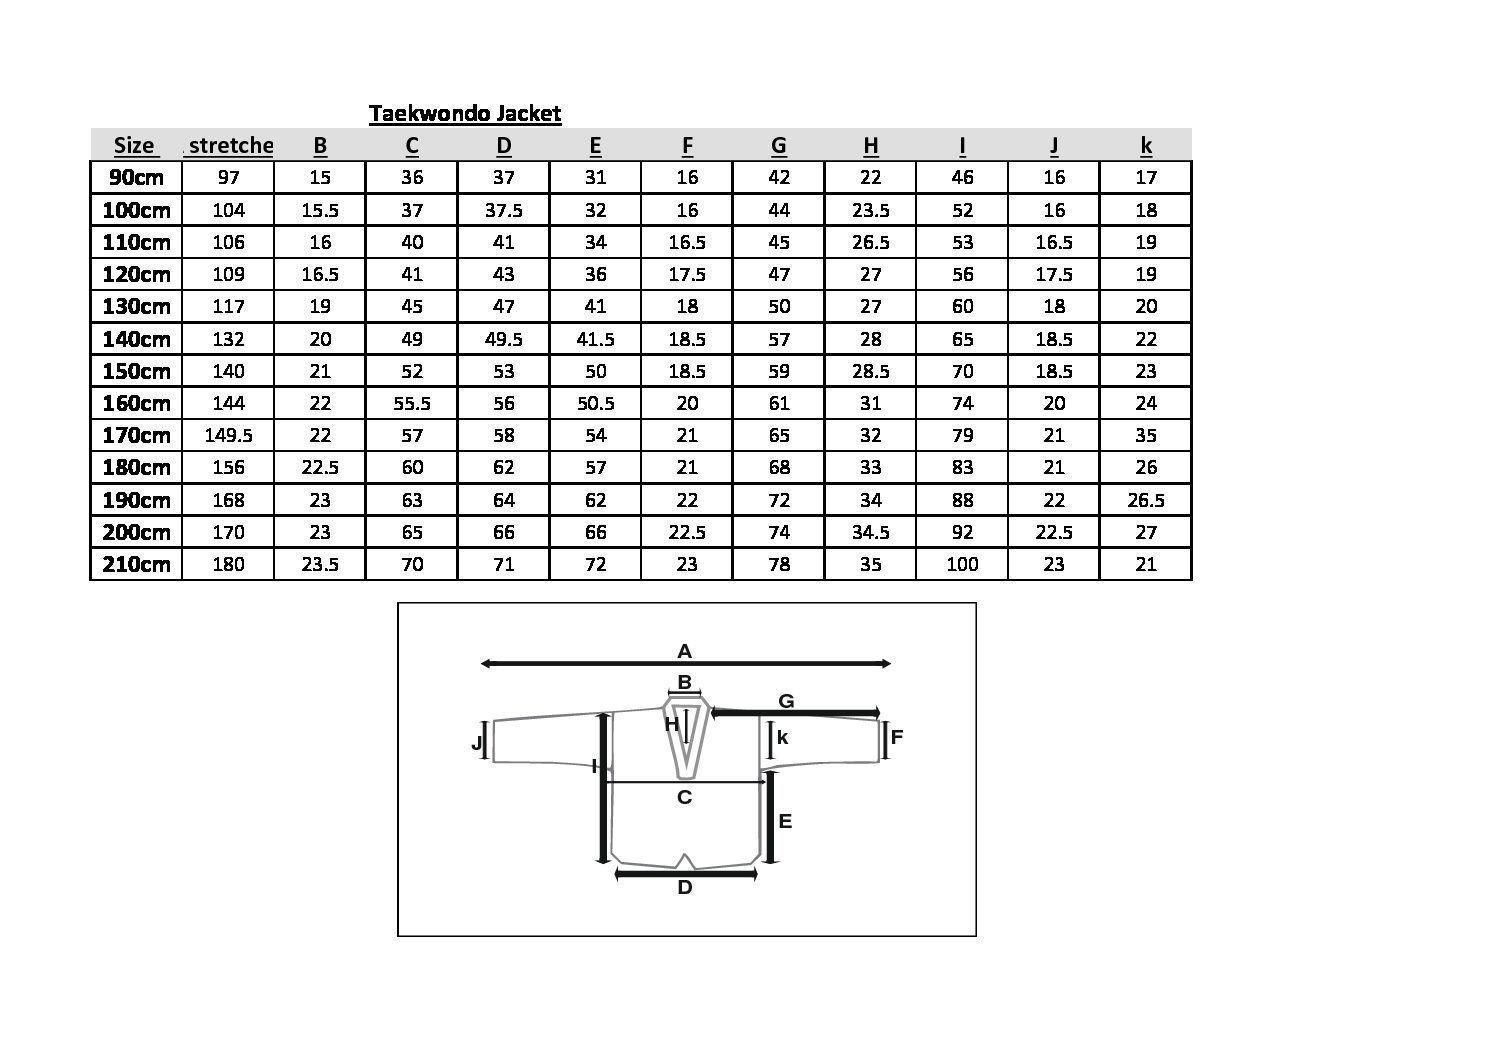 Tusah. Размеры добка WT 1